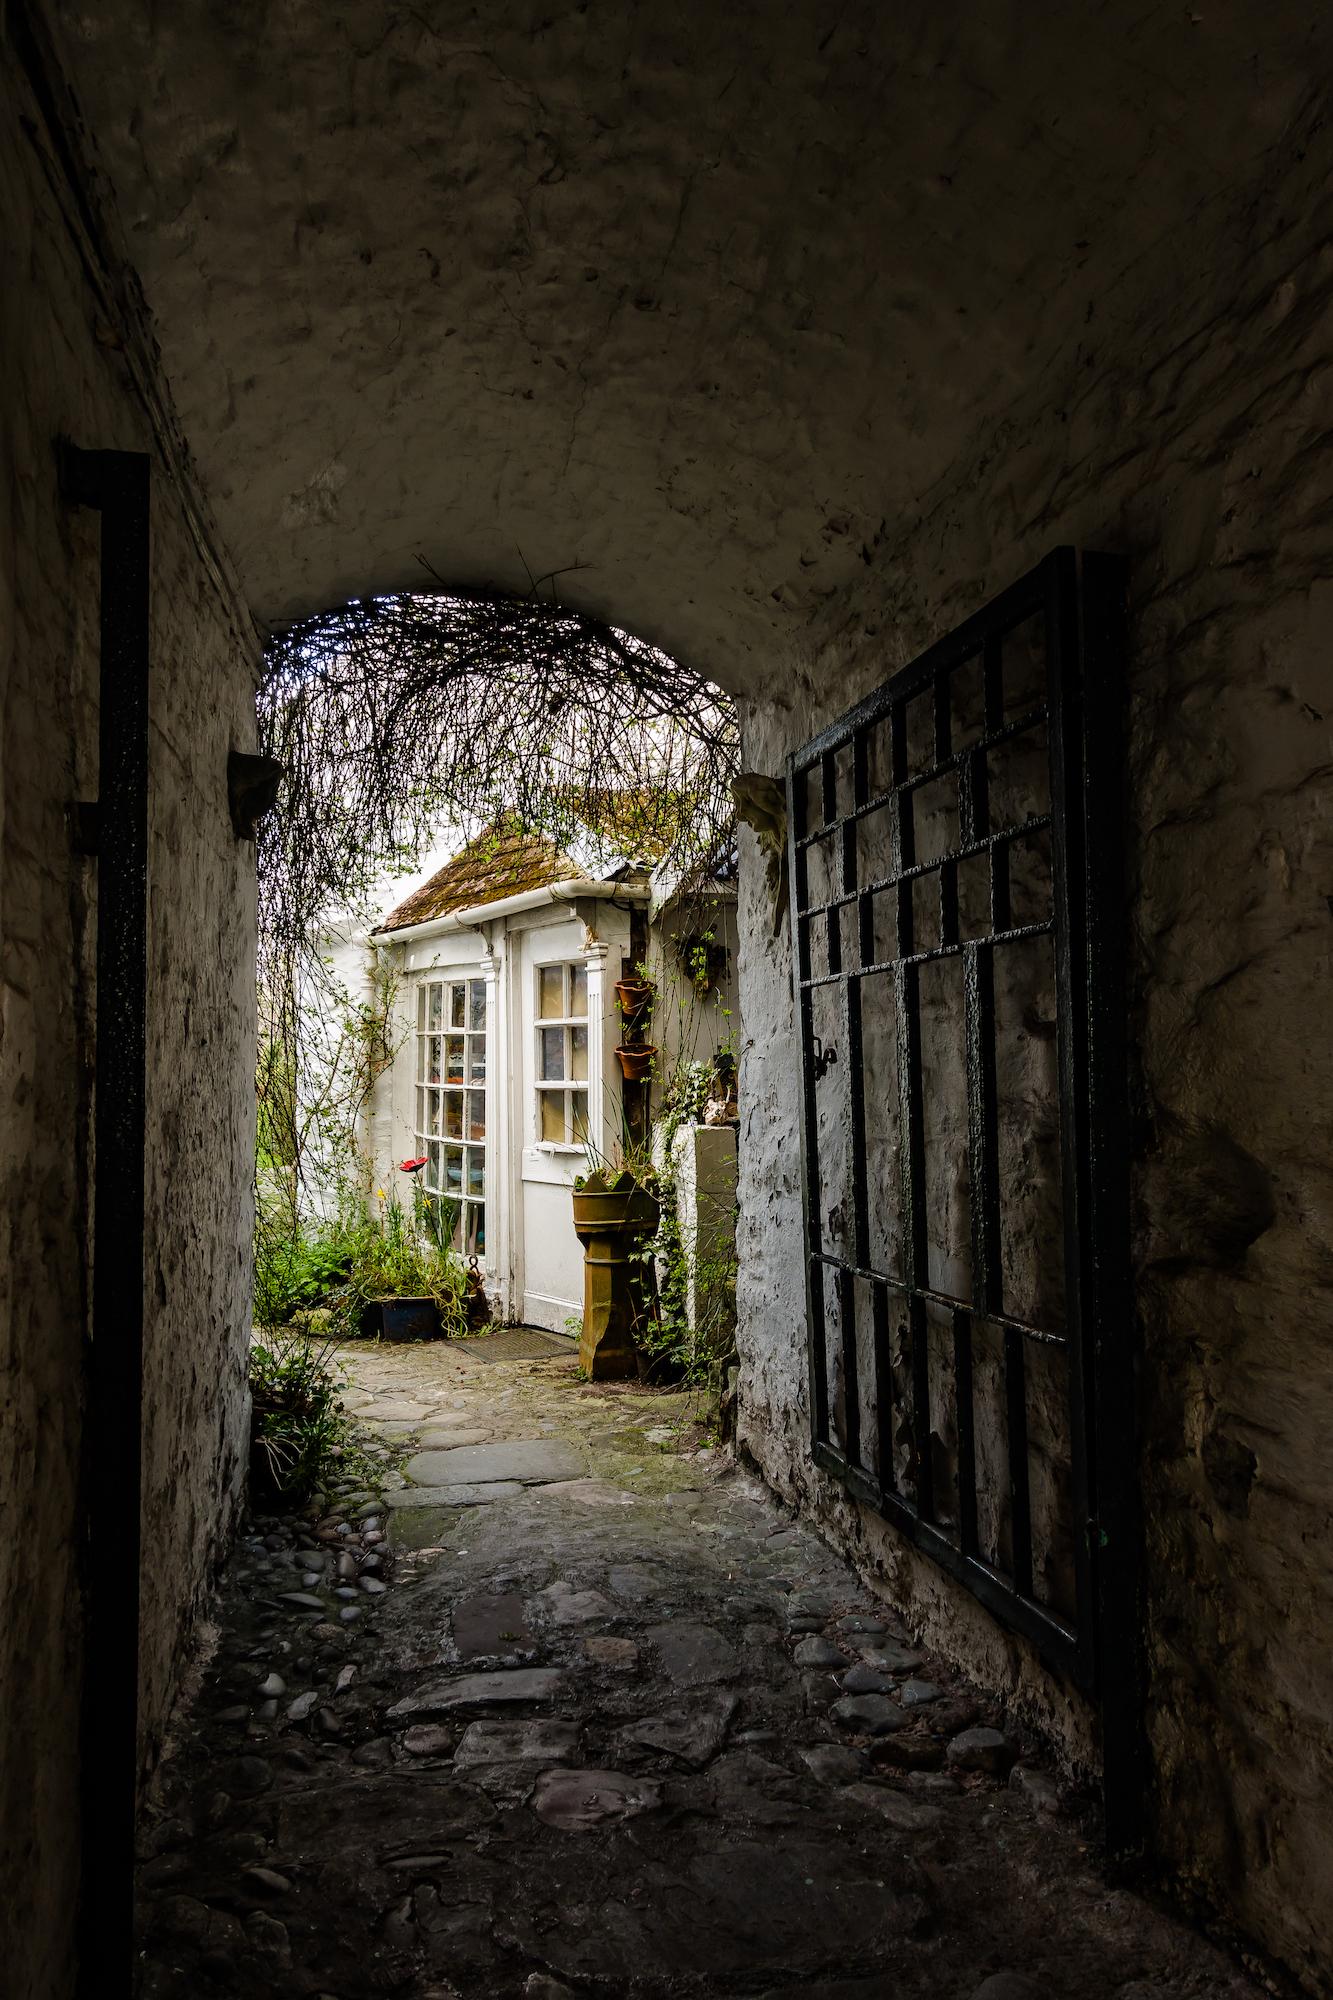 (786) Close off the High Street, Kirkcudbright, Dumfries and Galloway, Scotland.jpg